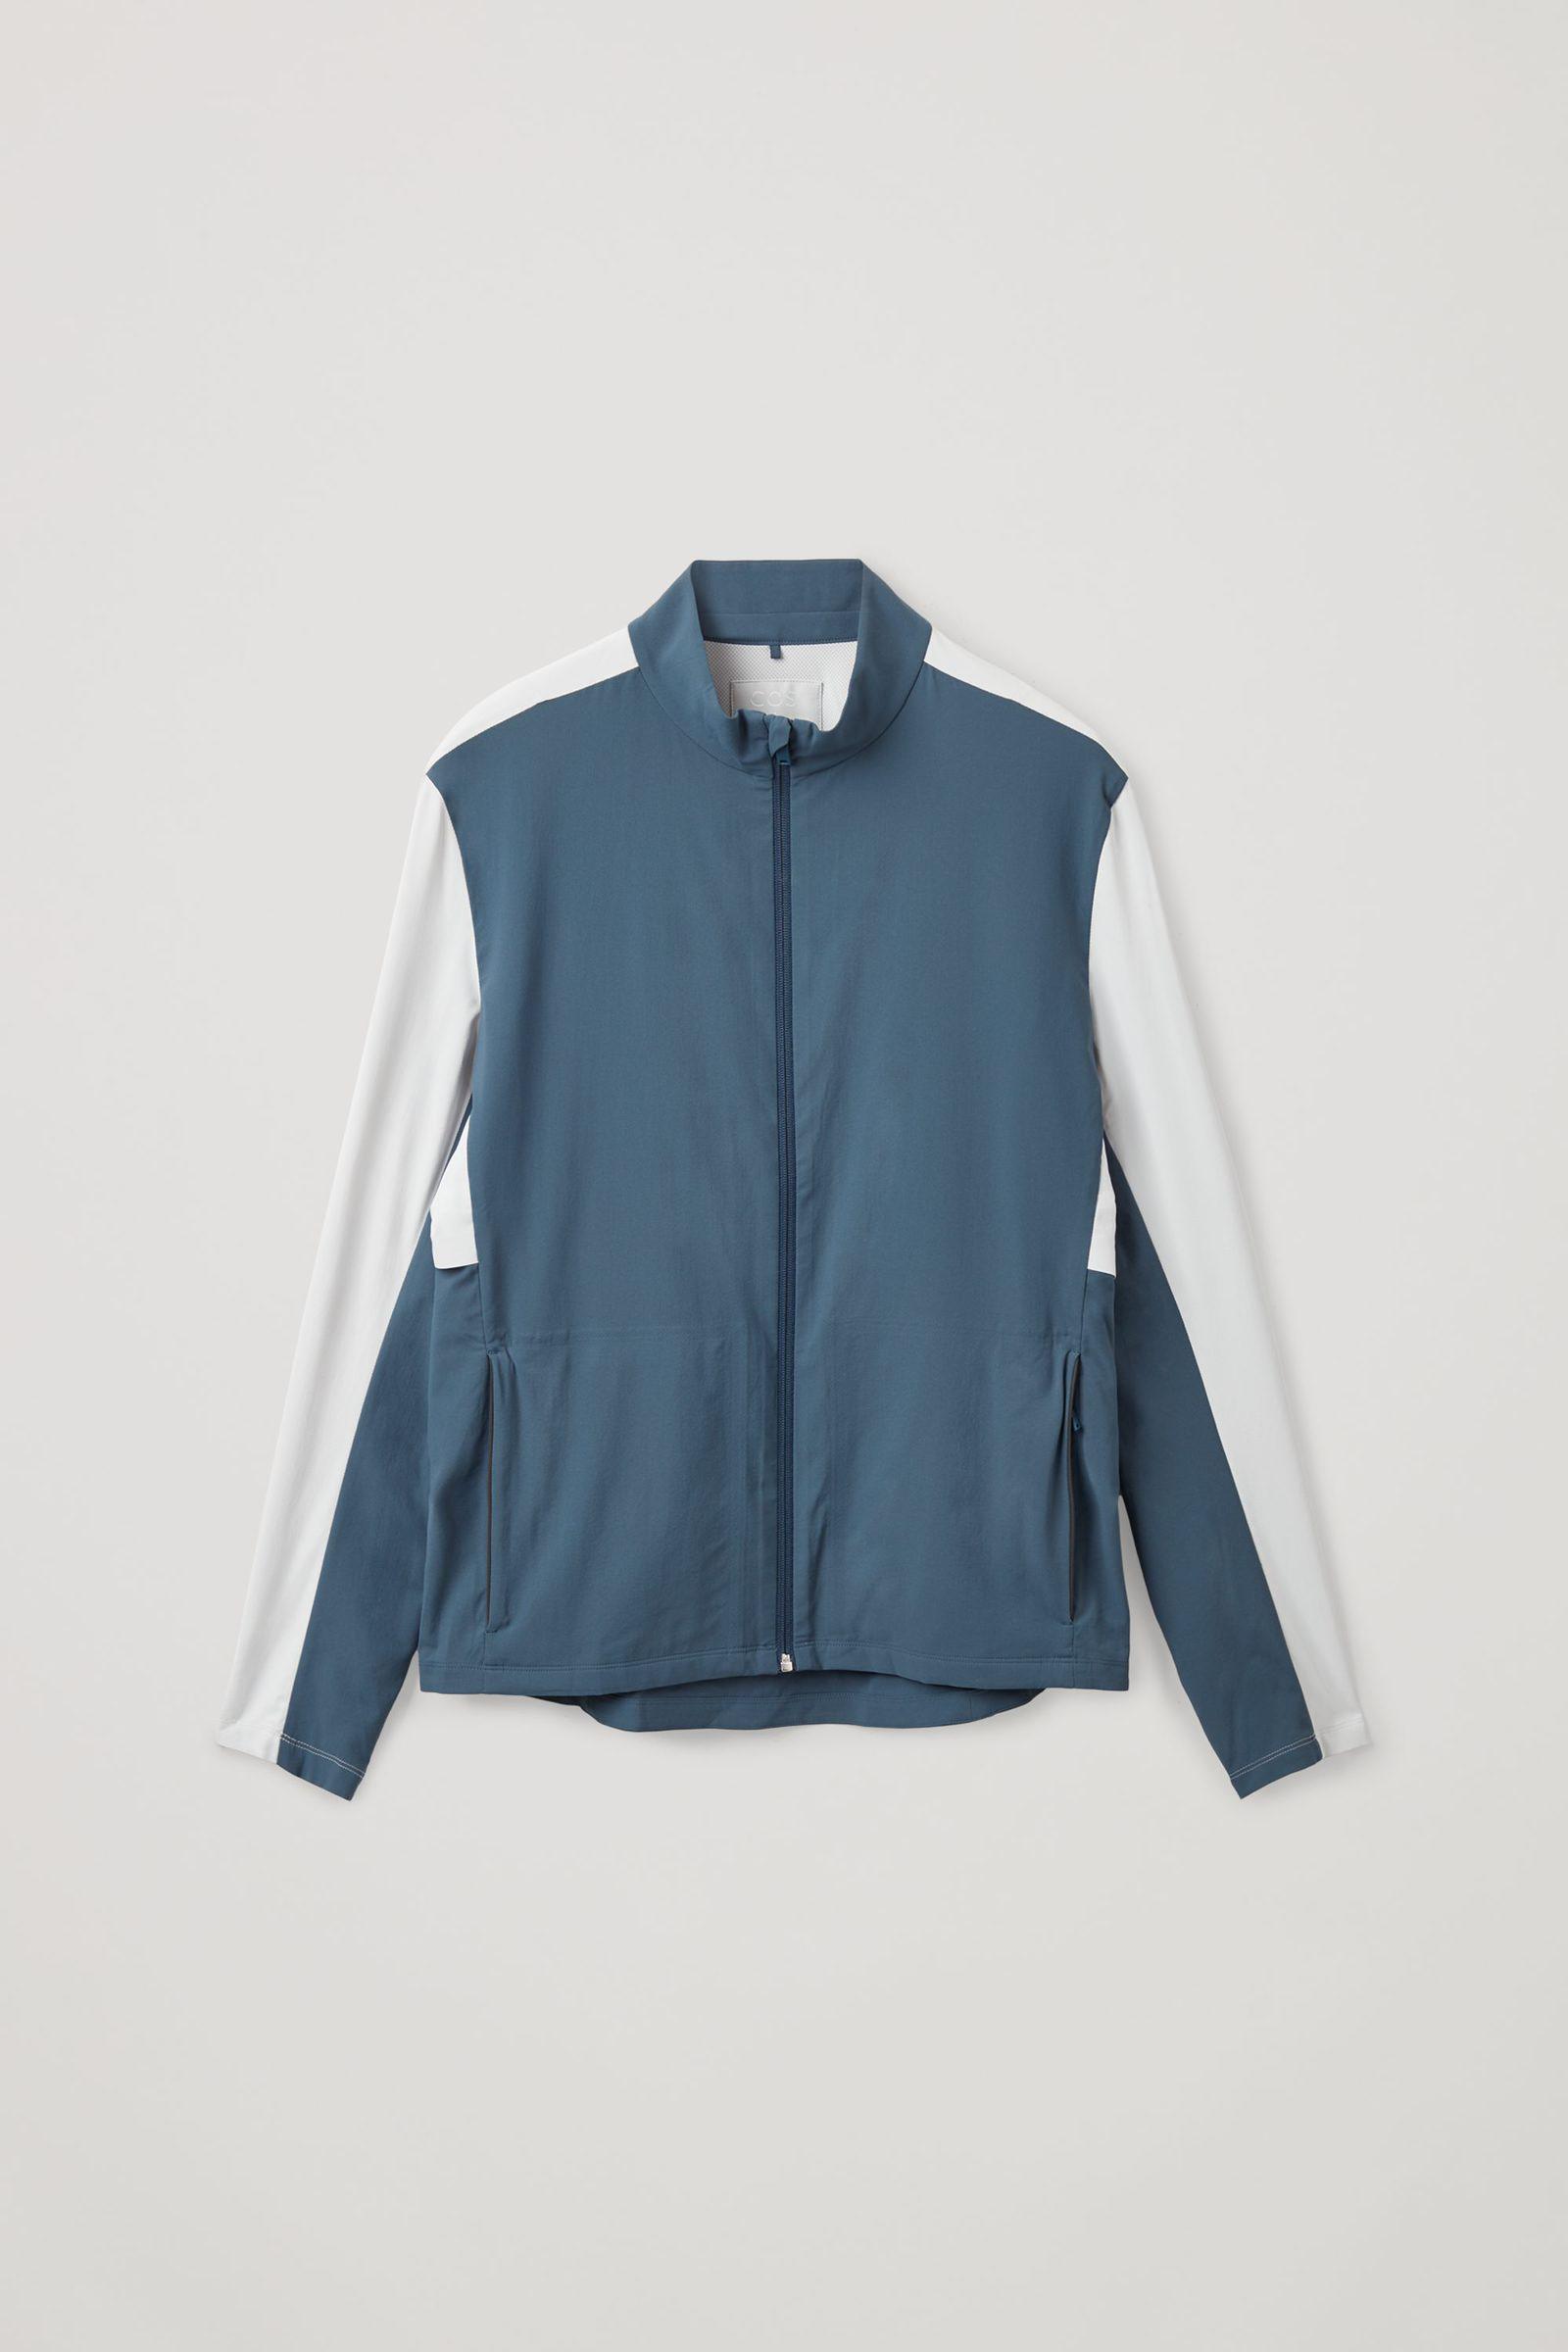 COS 리사이클드 폴리에스터 러닝 재킷의 다크 그린컬러 Product입니다.